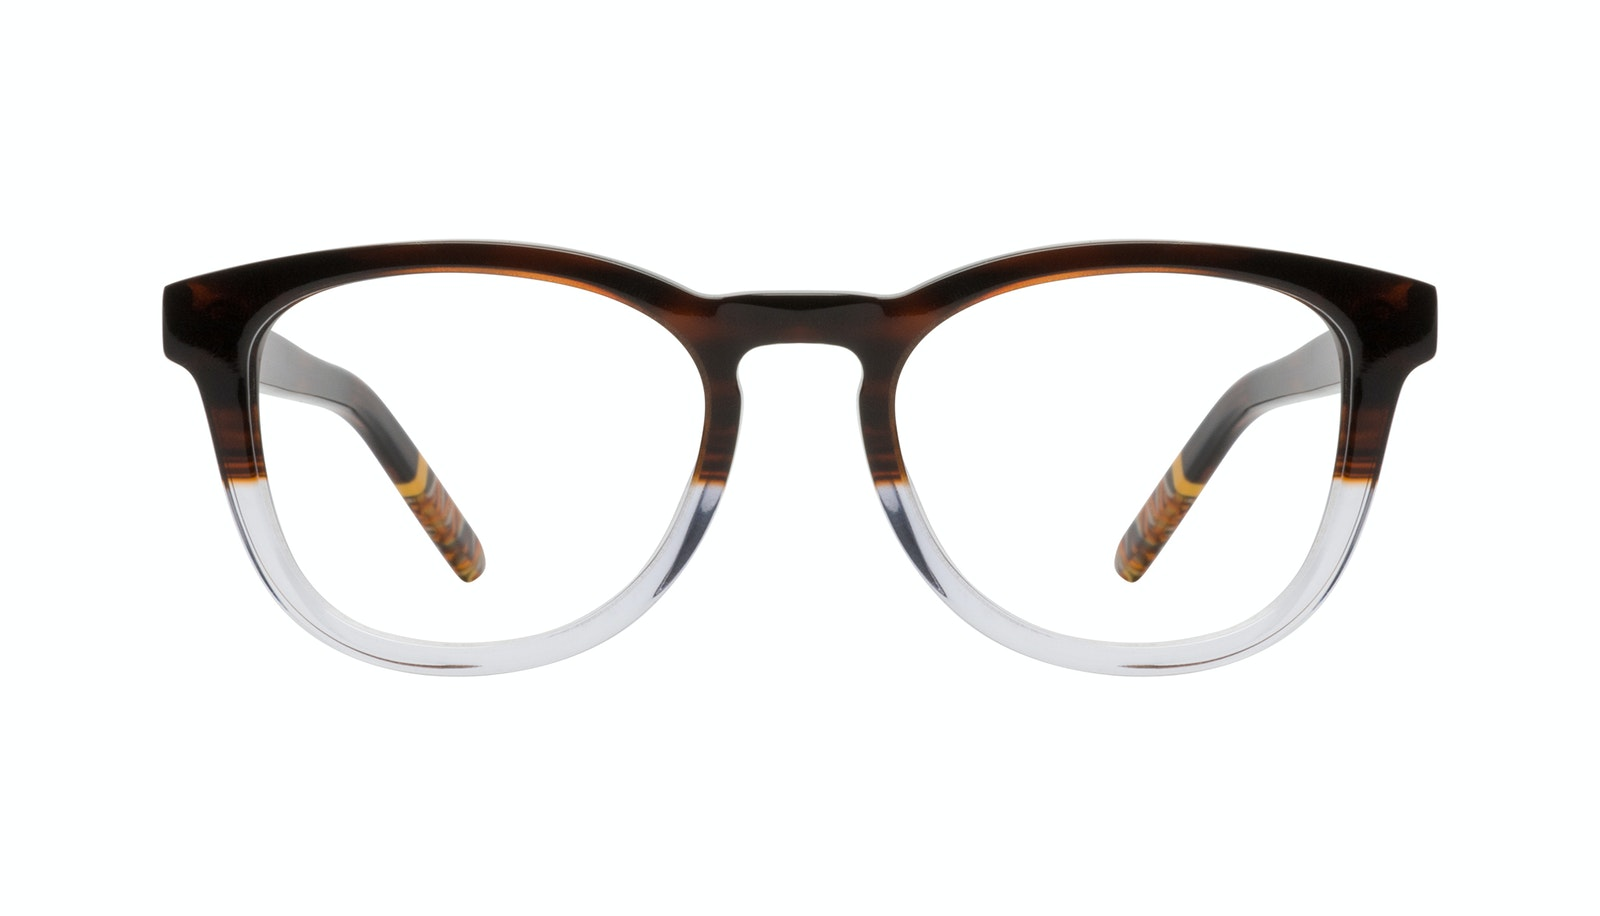 Affordable Fashion Glasses Round Eyeglasses Men Goal Bark